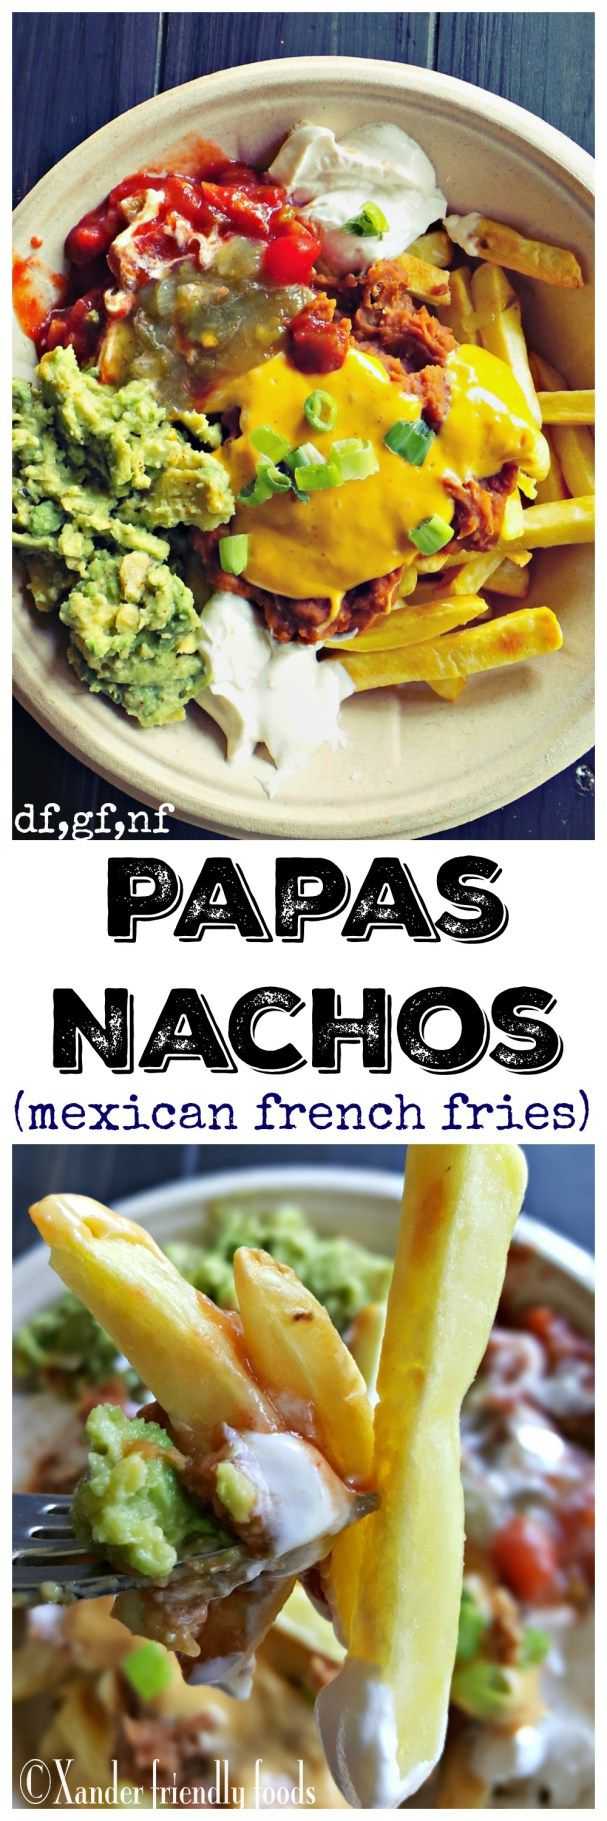 Papas Nachos -The heartiest, most delicious allergy-friendly twist on nachos…